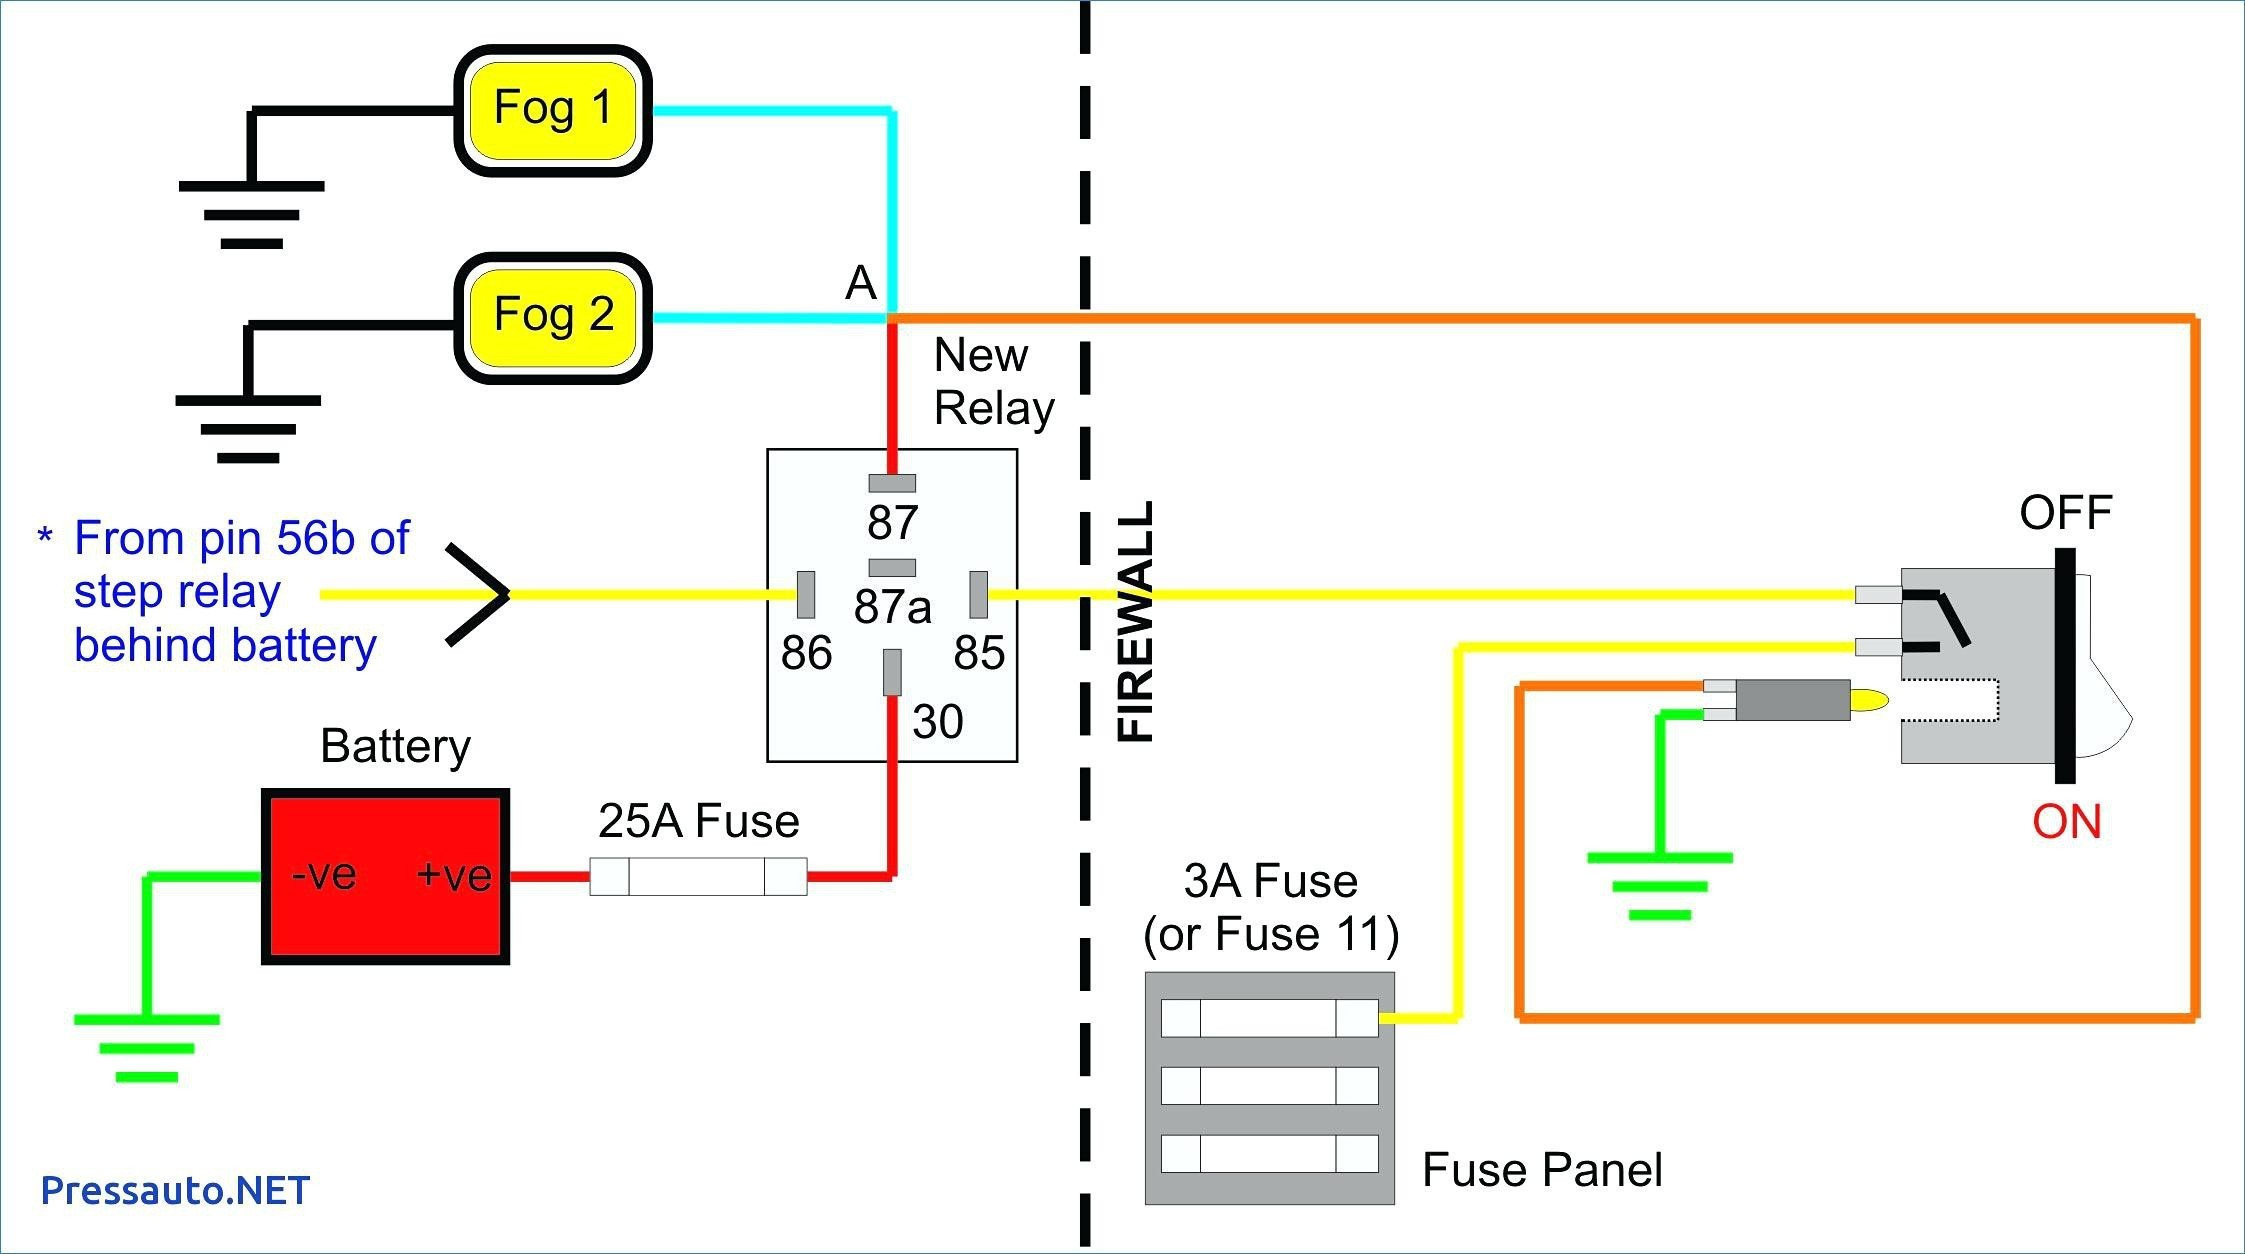 Bosch Fog Light Wiring Diagram   Wiring Diagram - Foglight Wiring Diagram